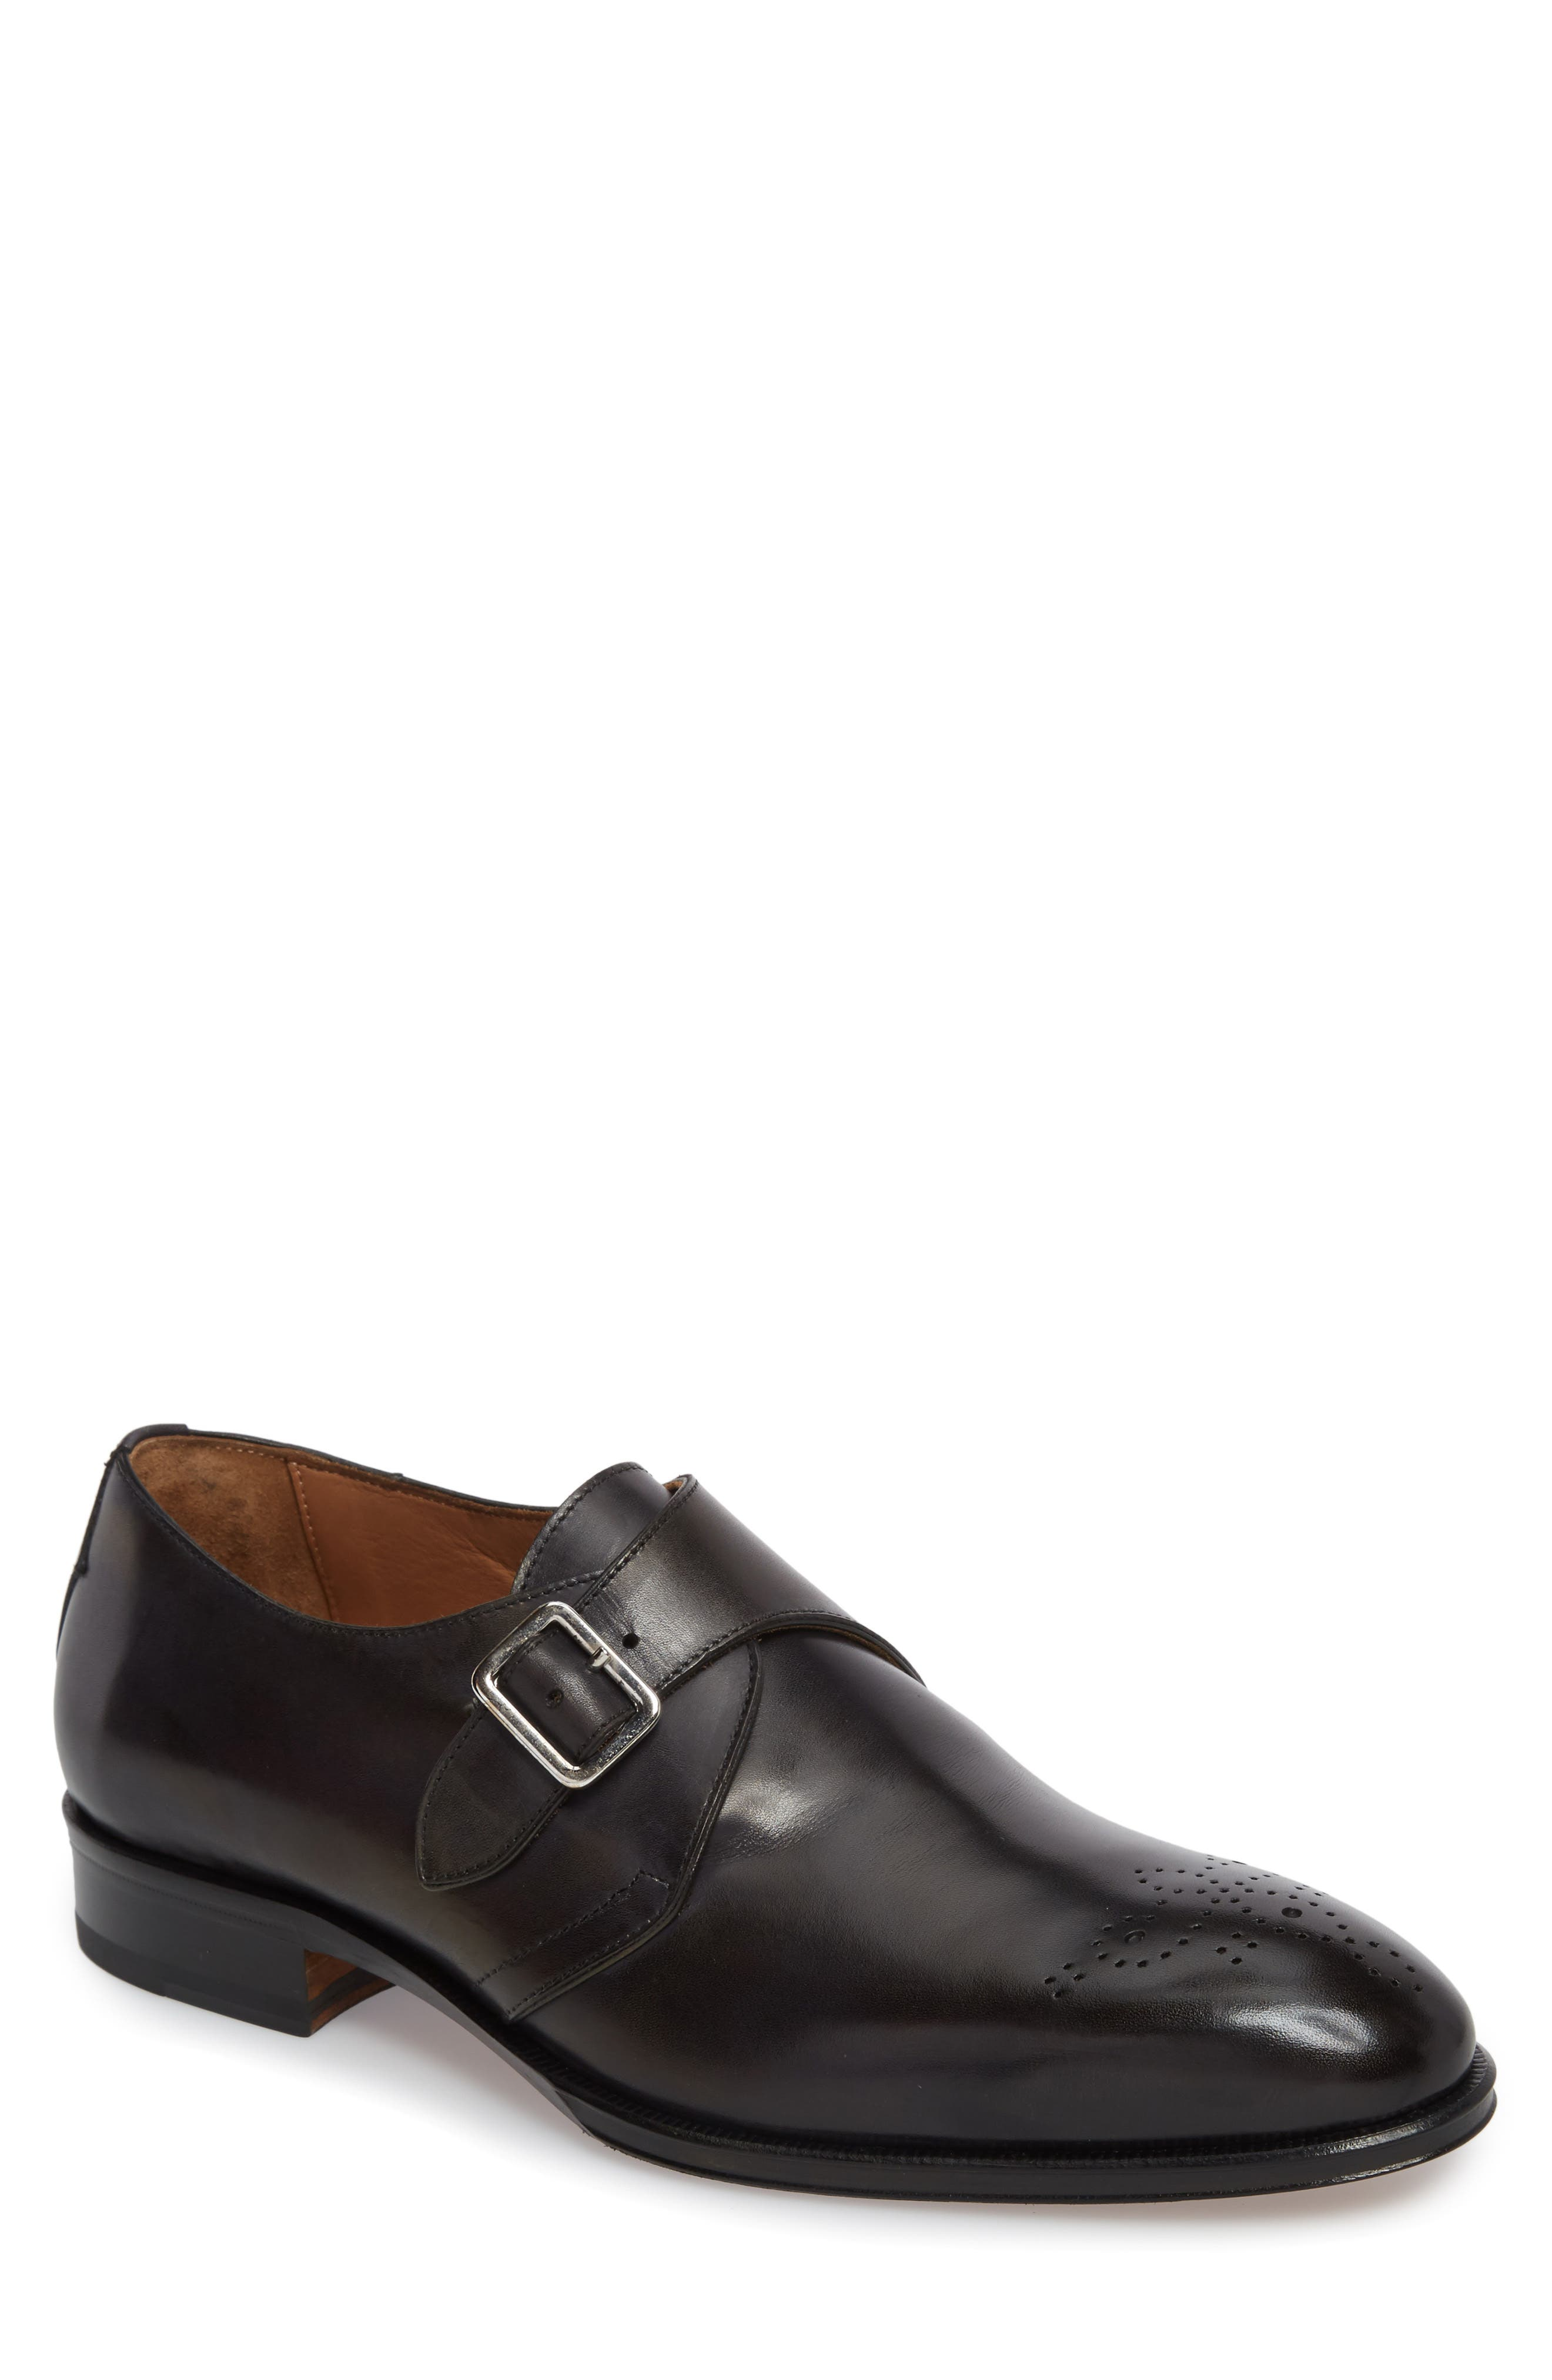 Gallo Bianco Bologna Monk Strap Shoe (Men)